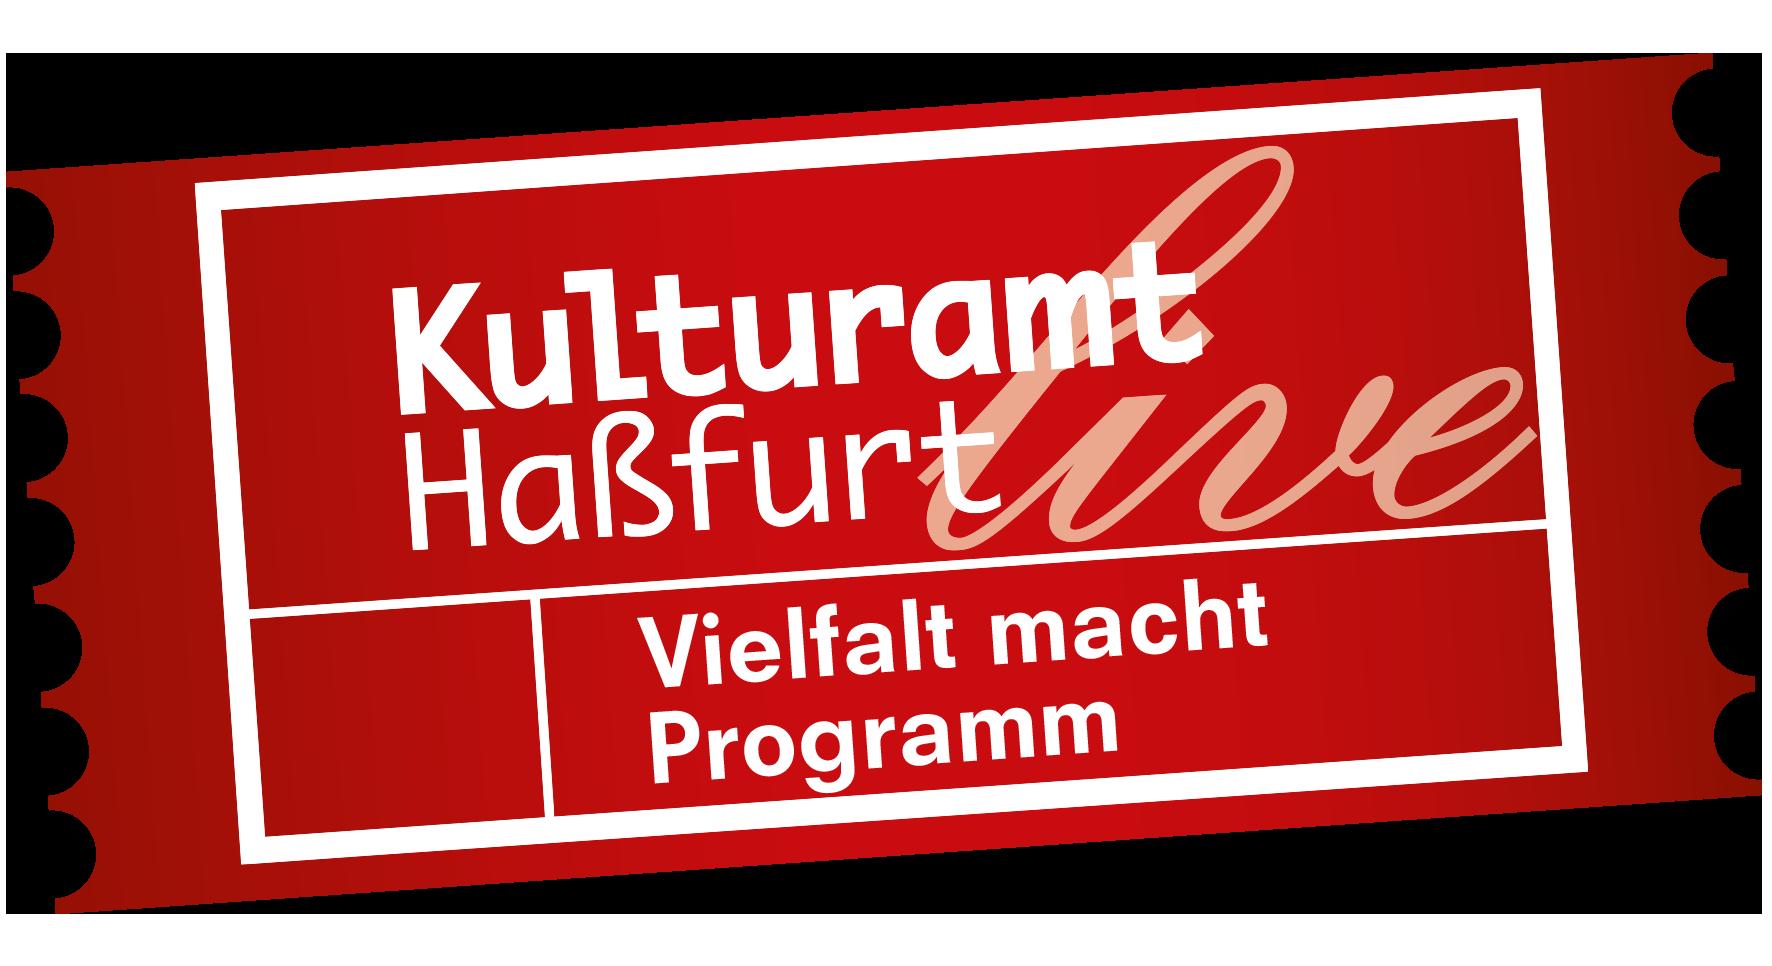 Kulturamt Hassfurt